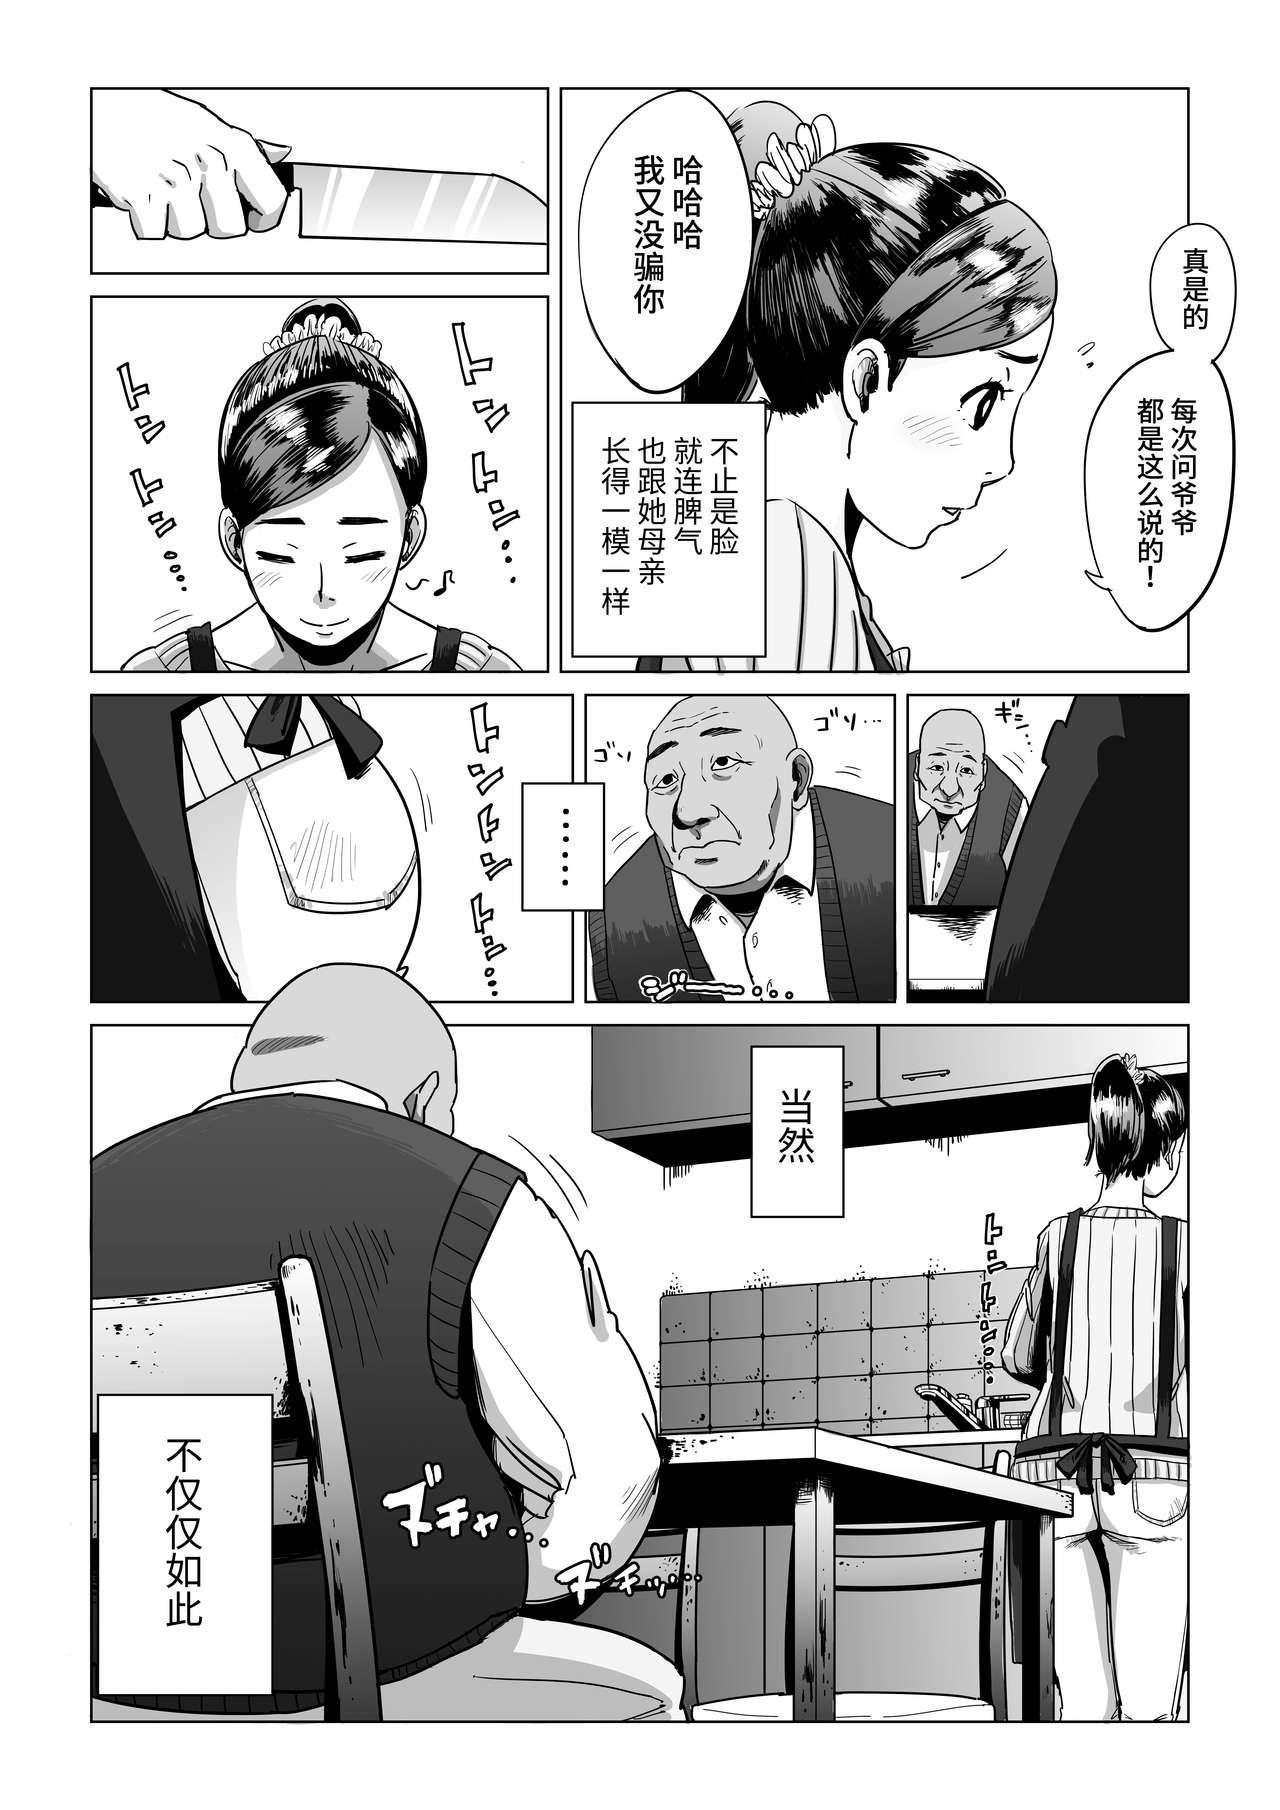 Sofu, Mago to Asobu 2